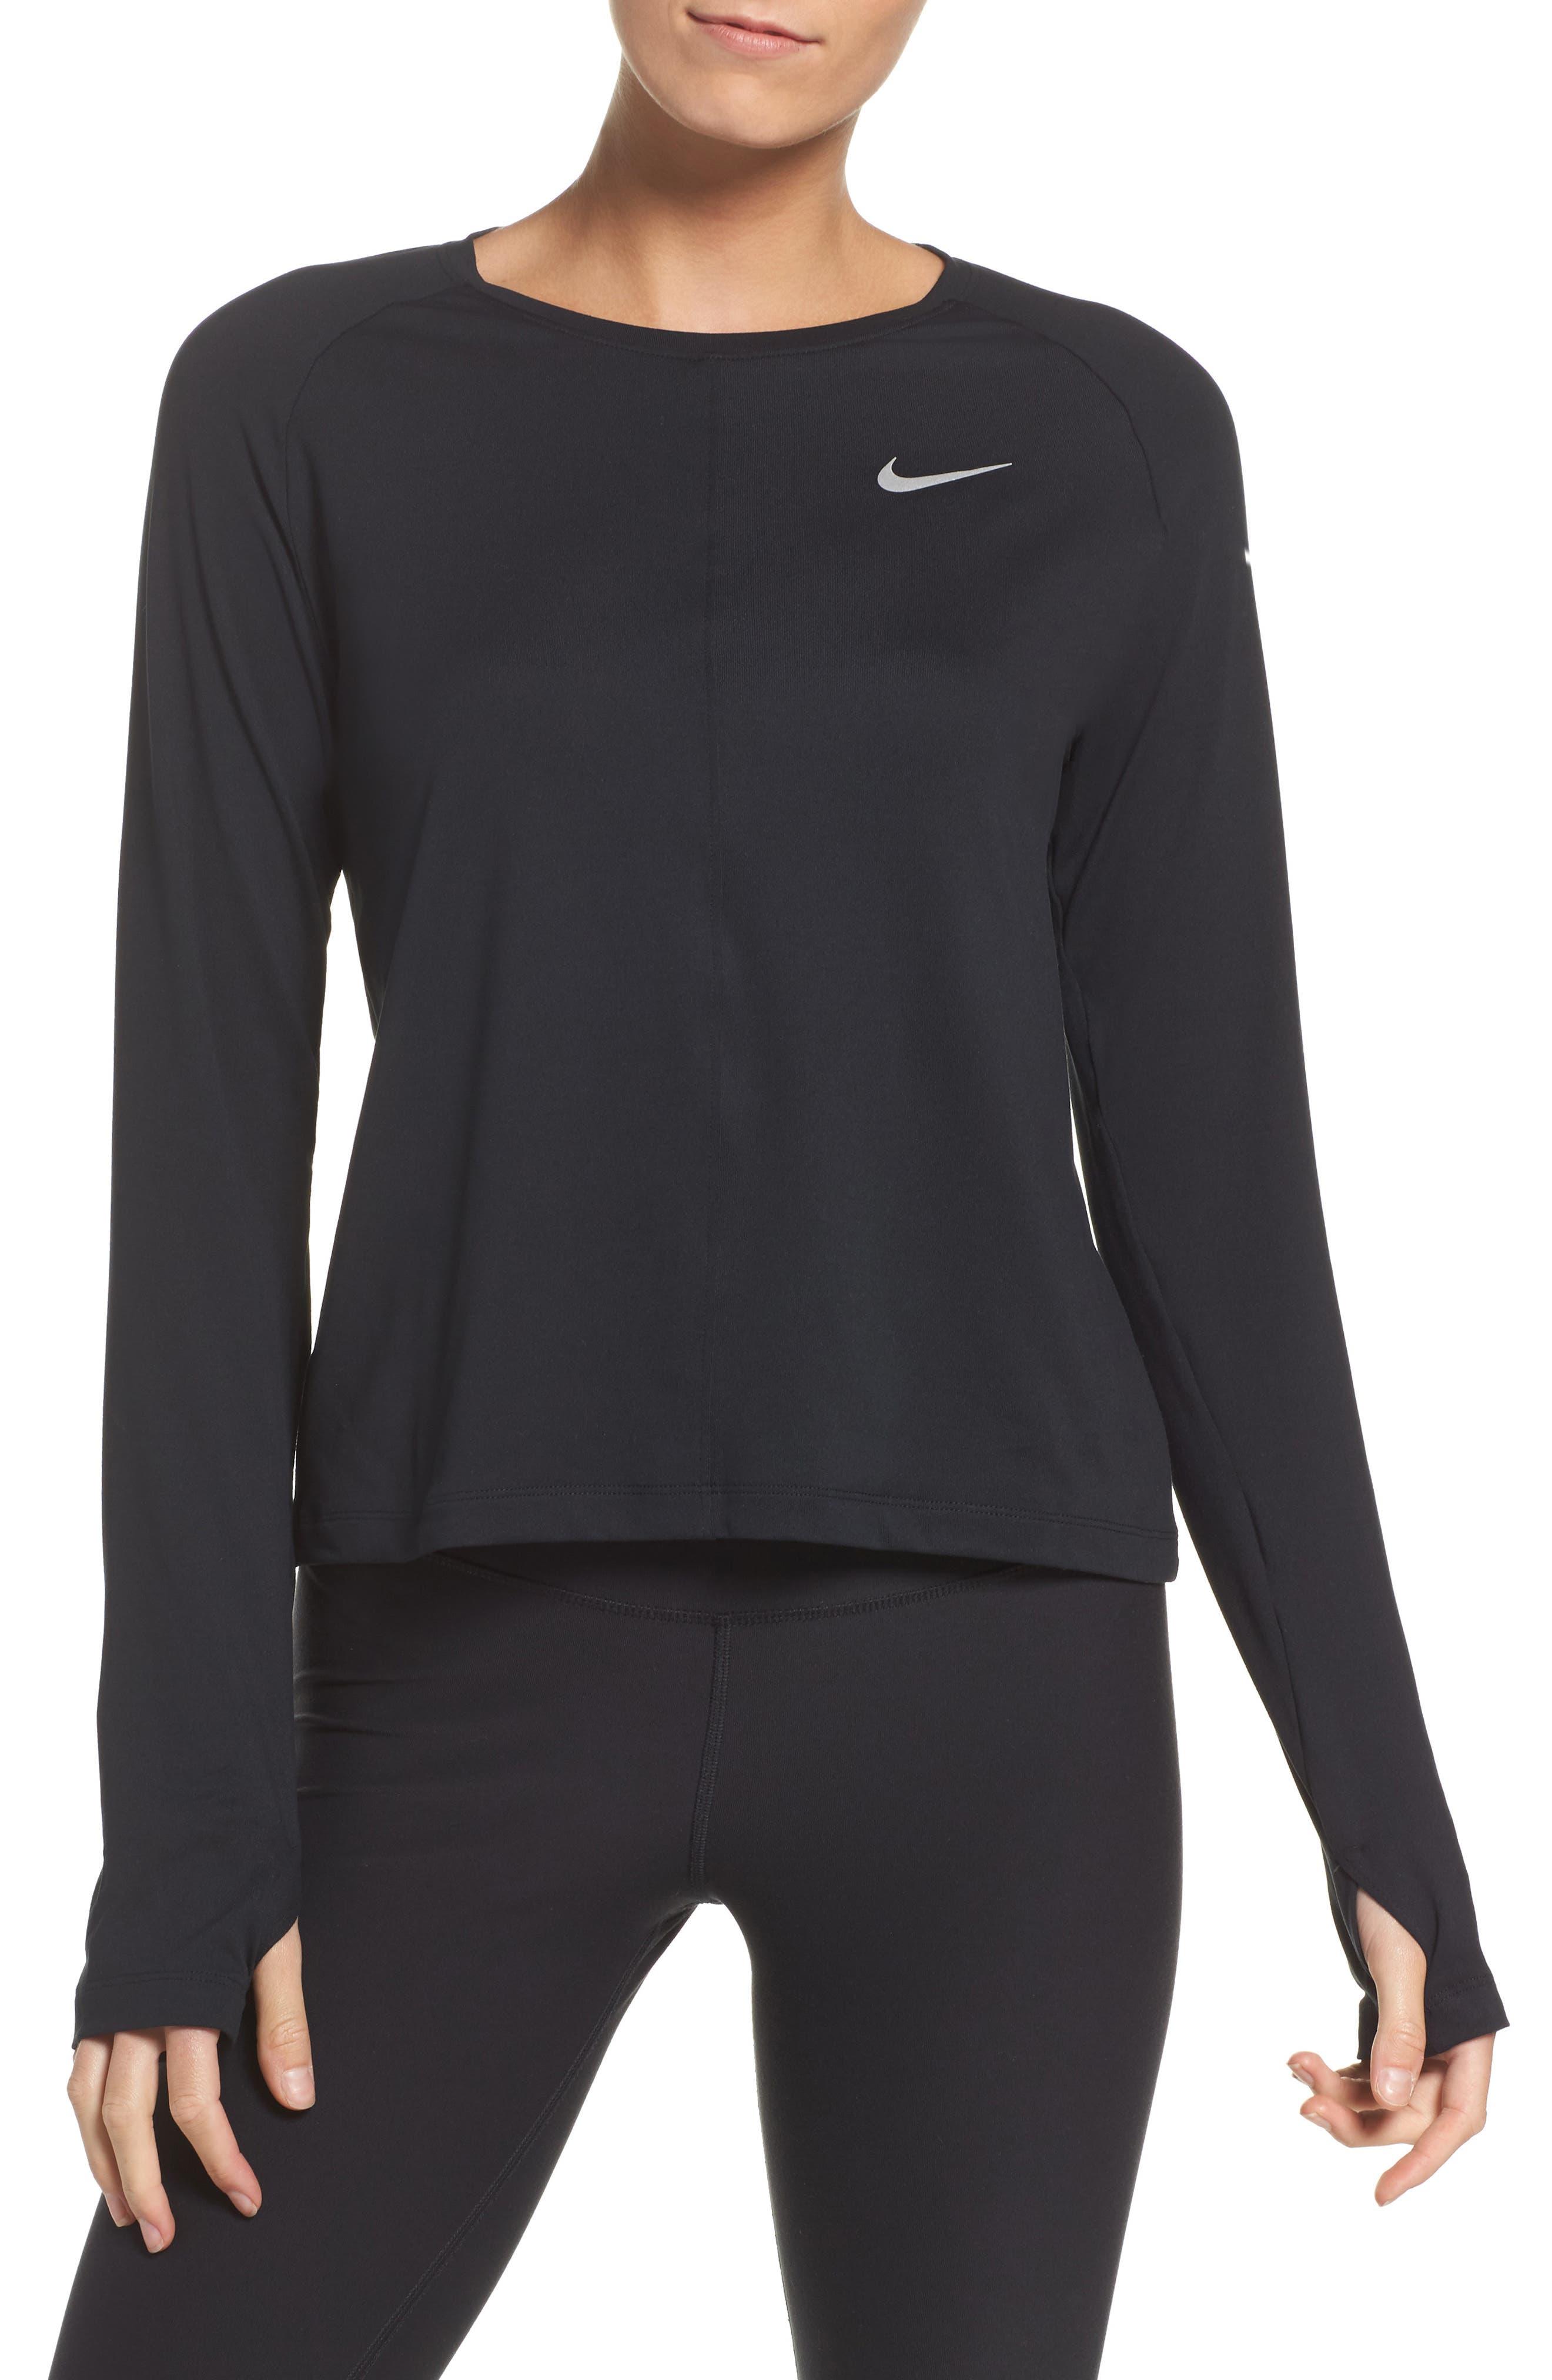 Nike Dry Element Crop Top